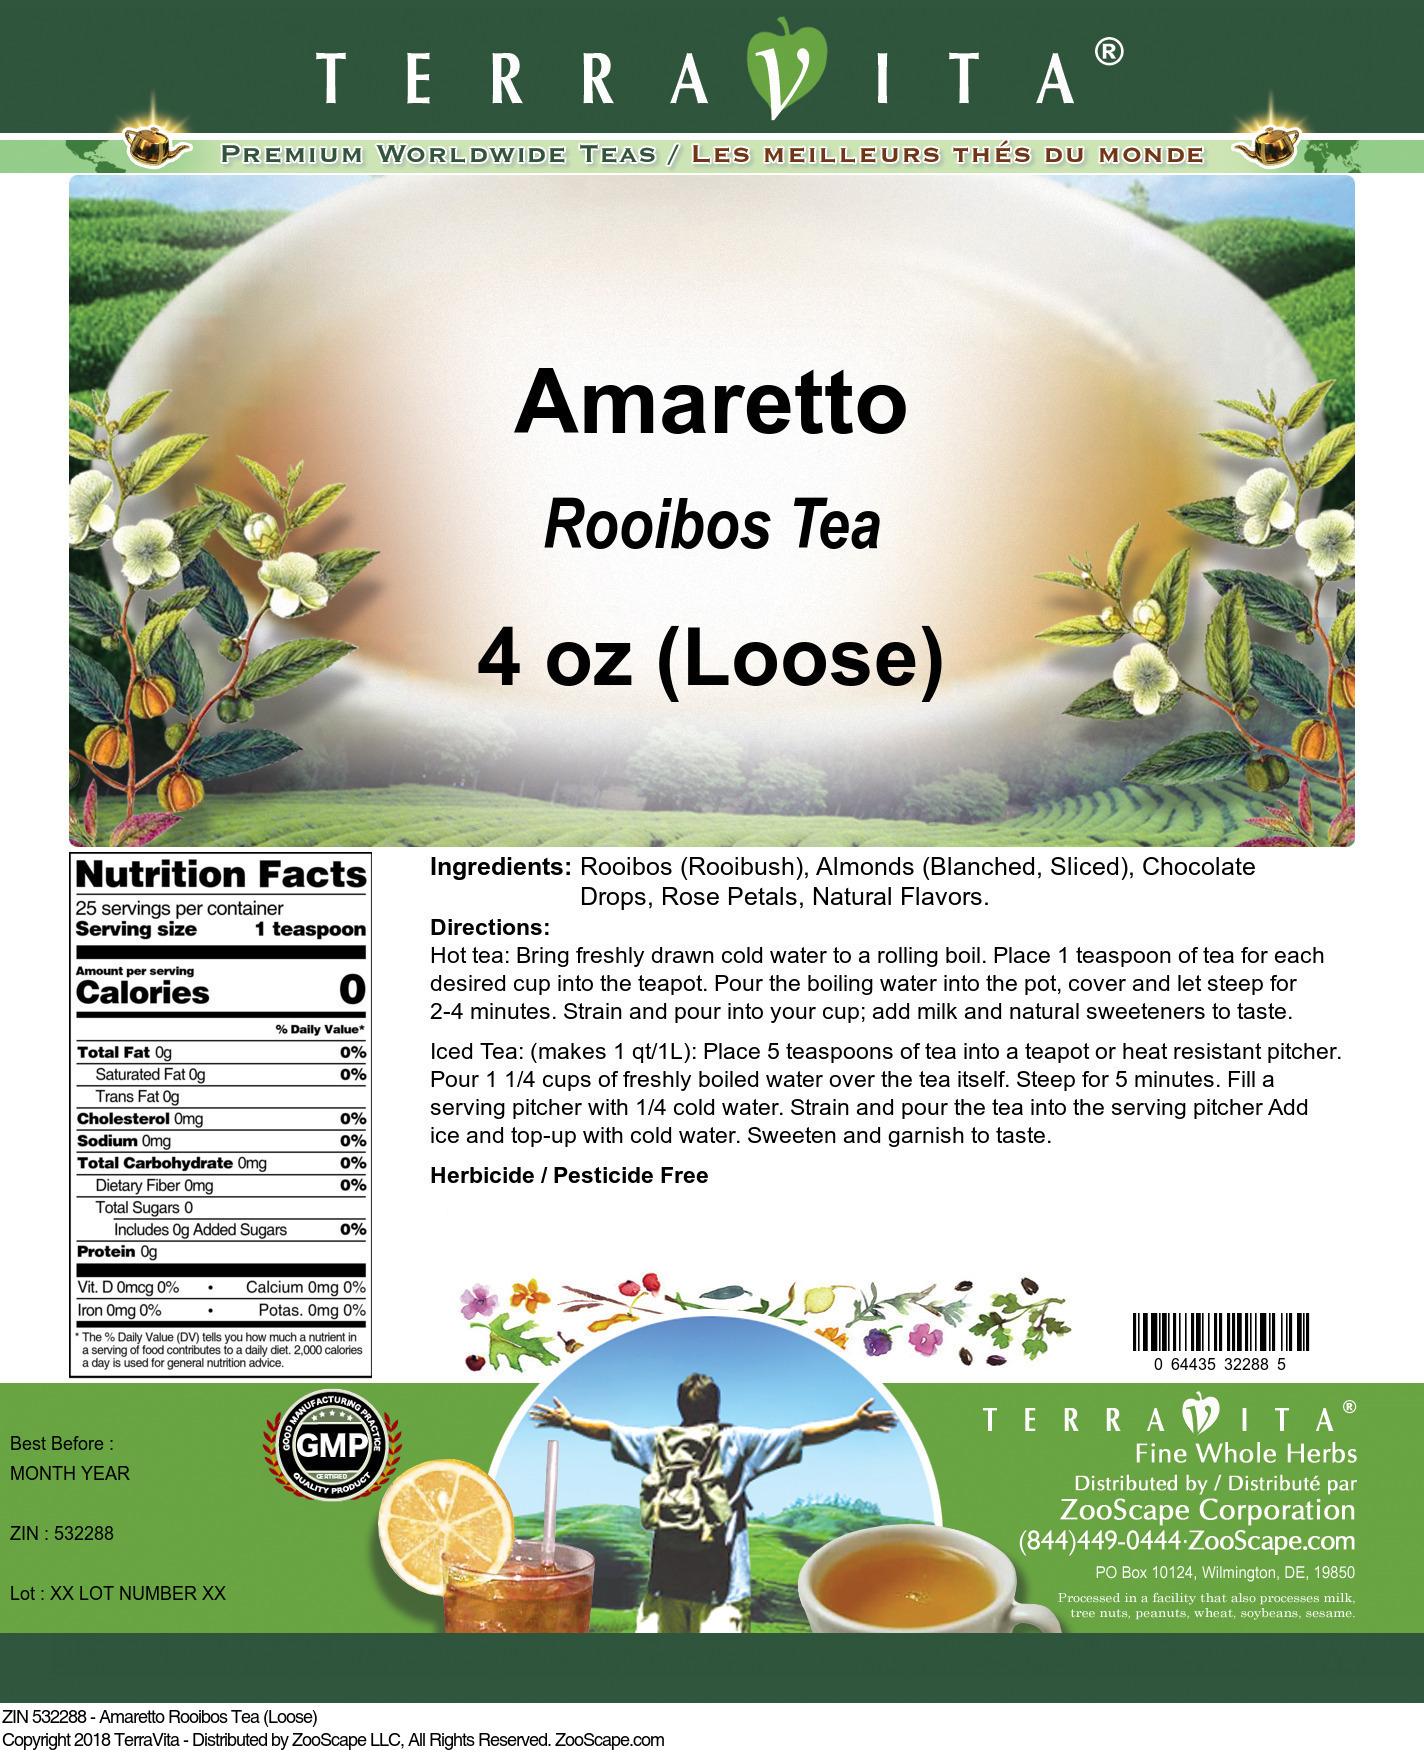 Amaretto Rooibos Tea